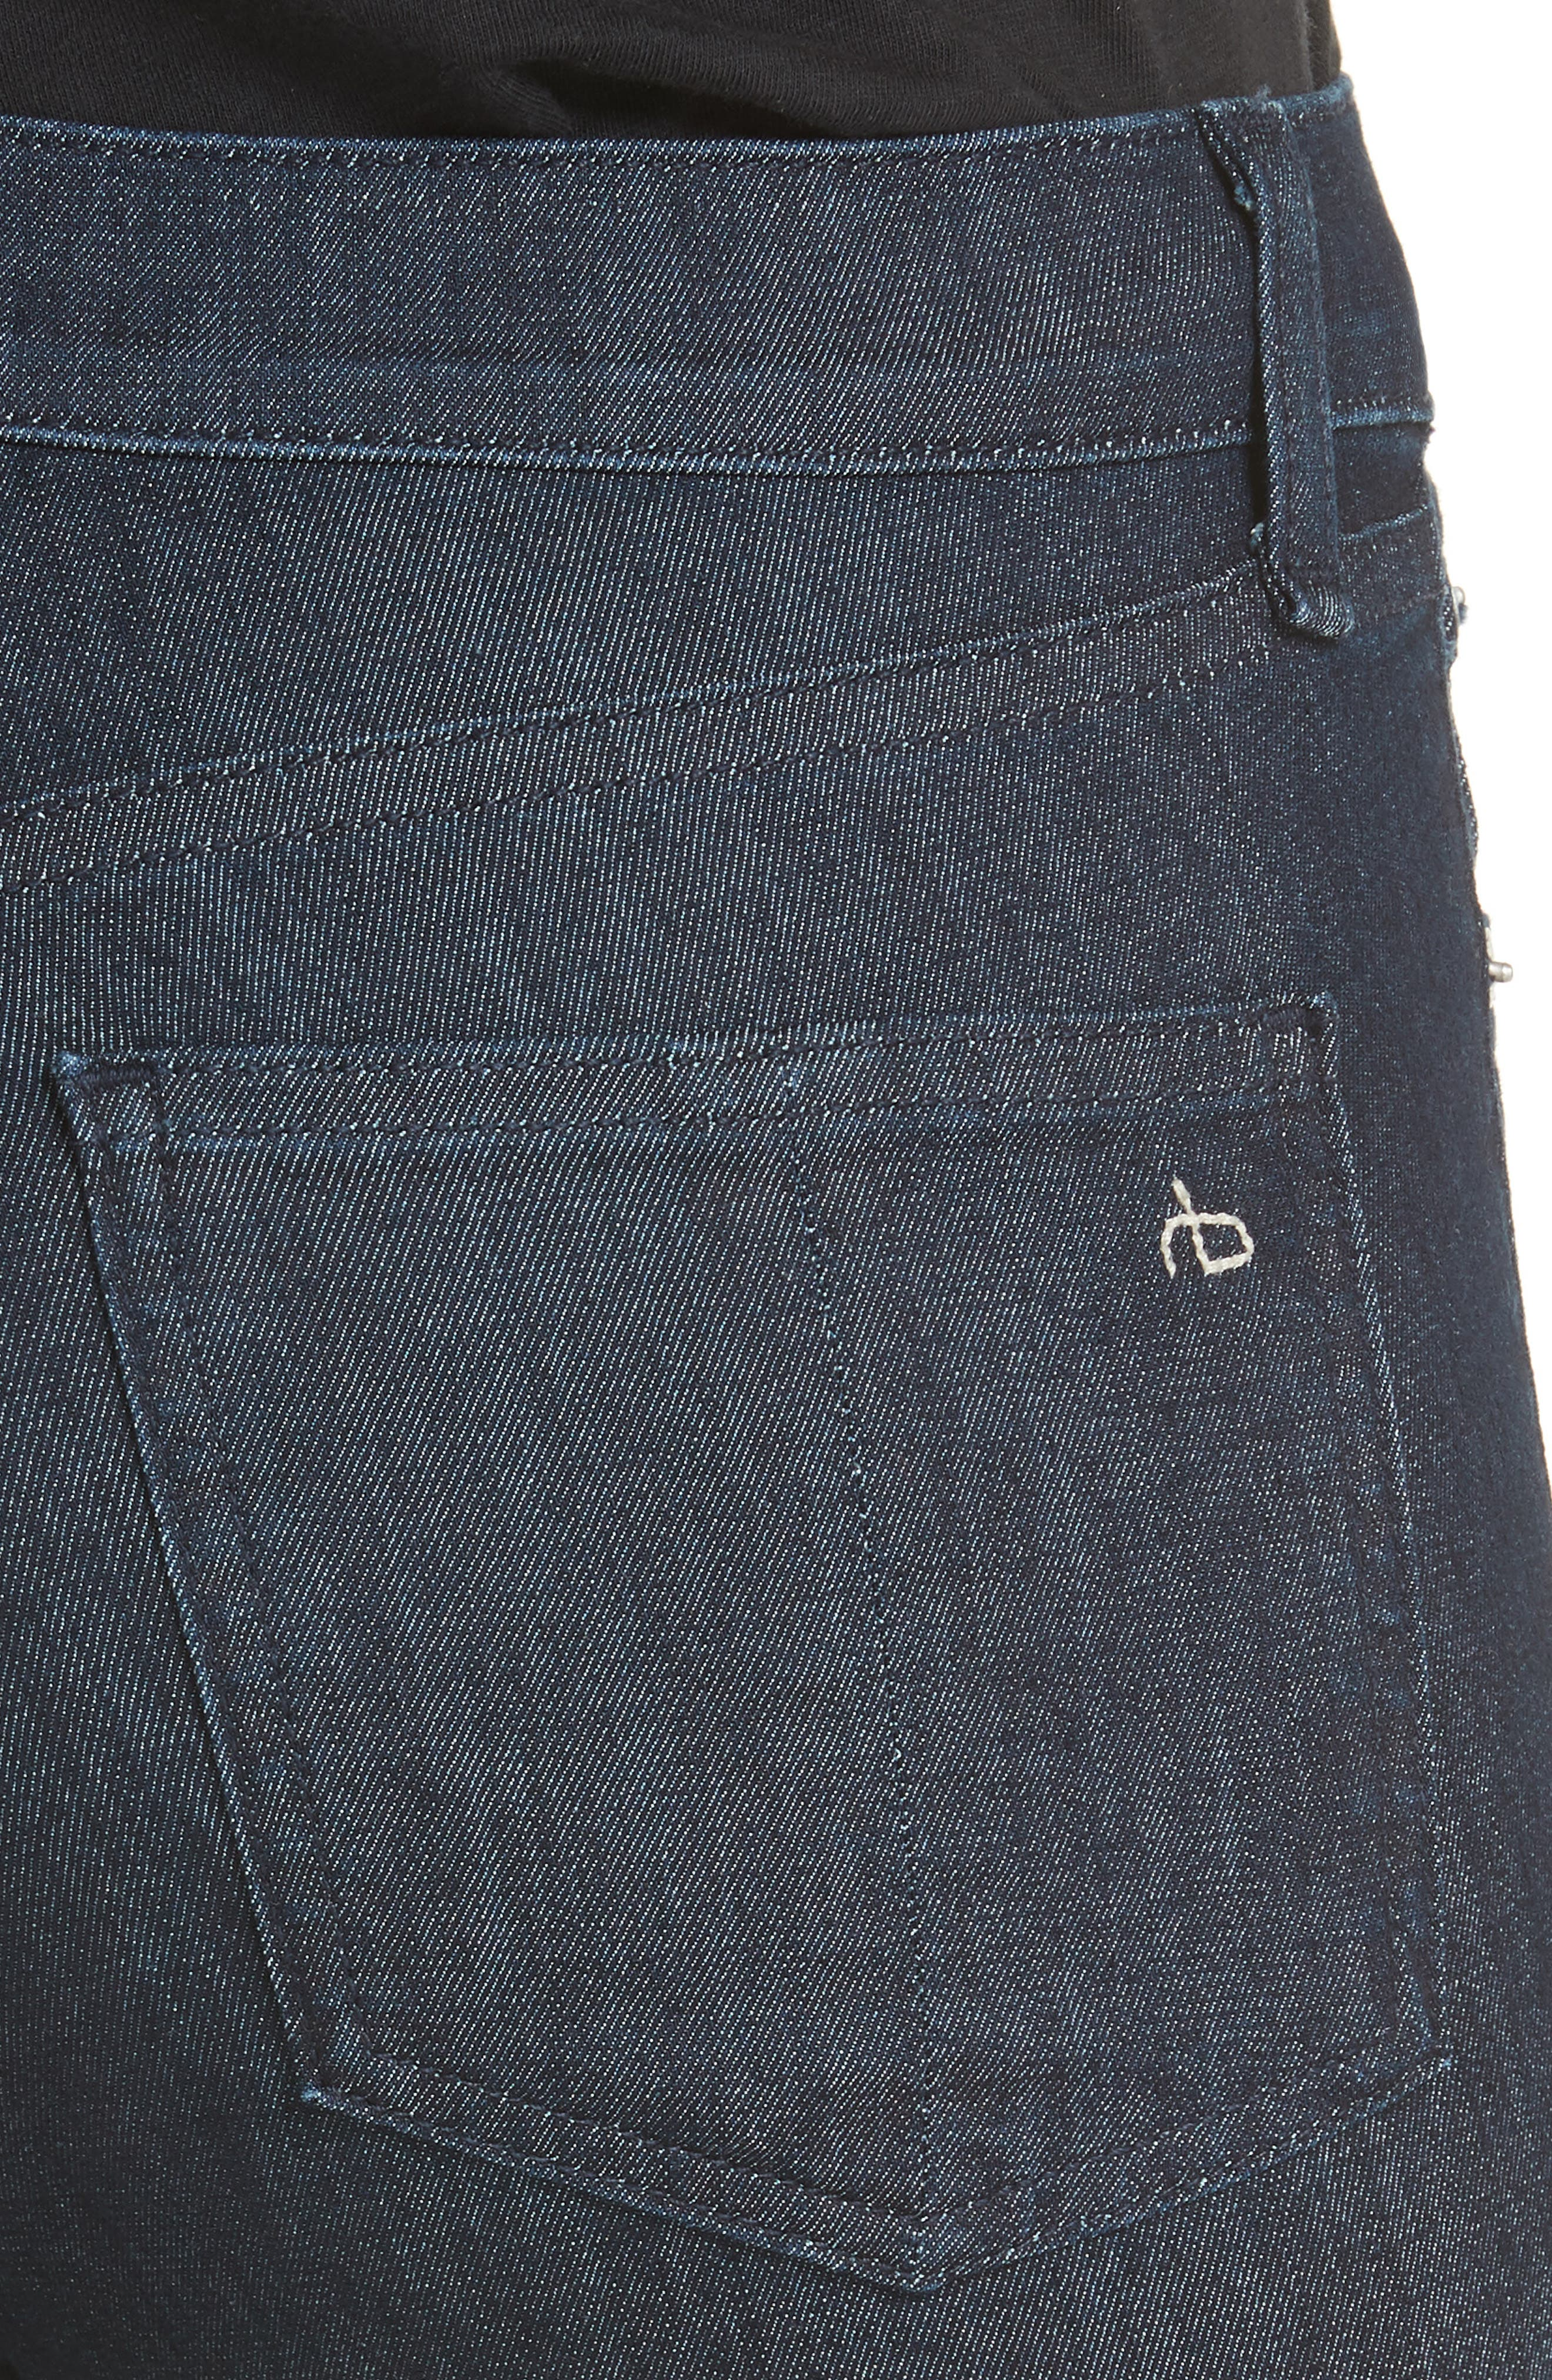 High Waist Skinny Jeans,                             Alternate thumbnail 4, color,                             INDIGO